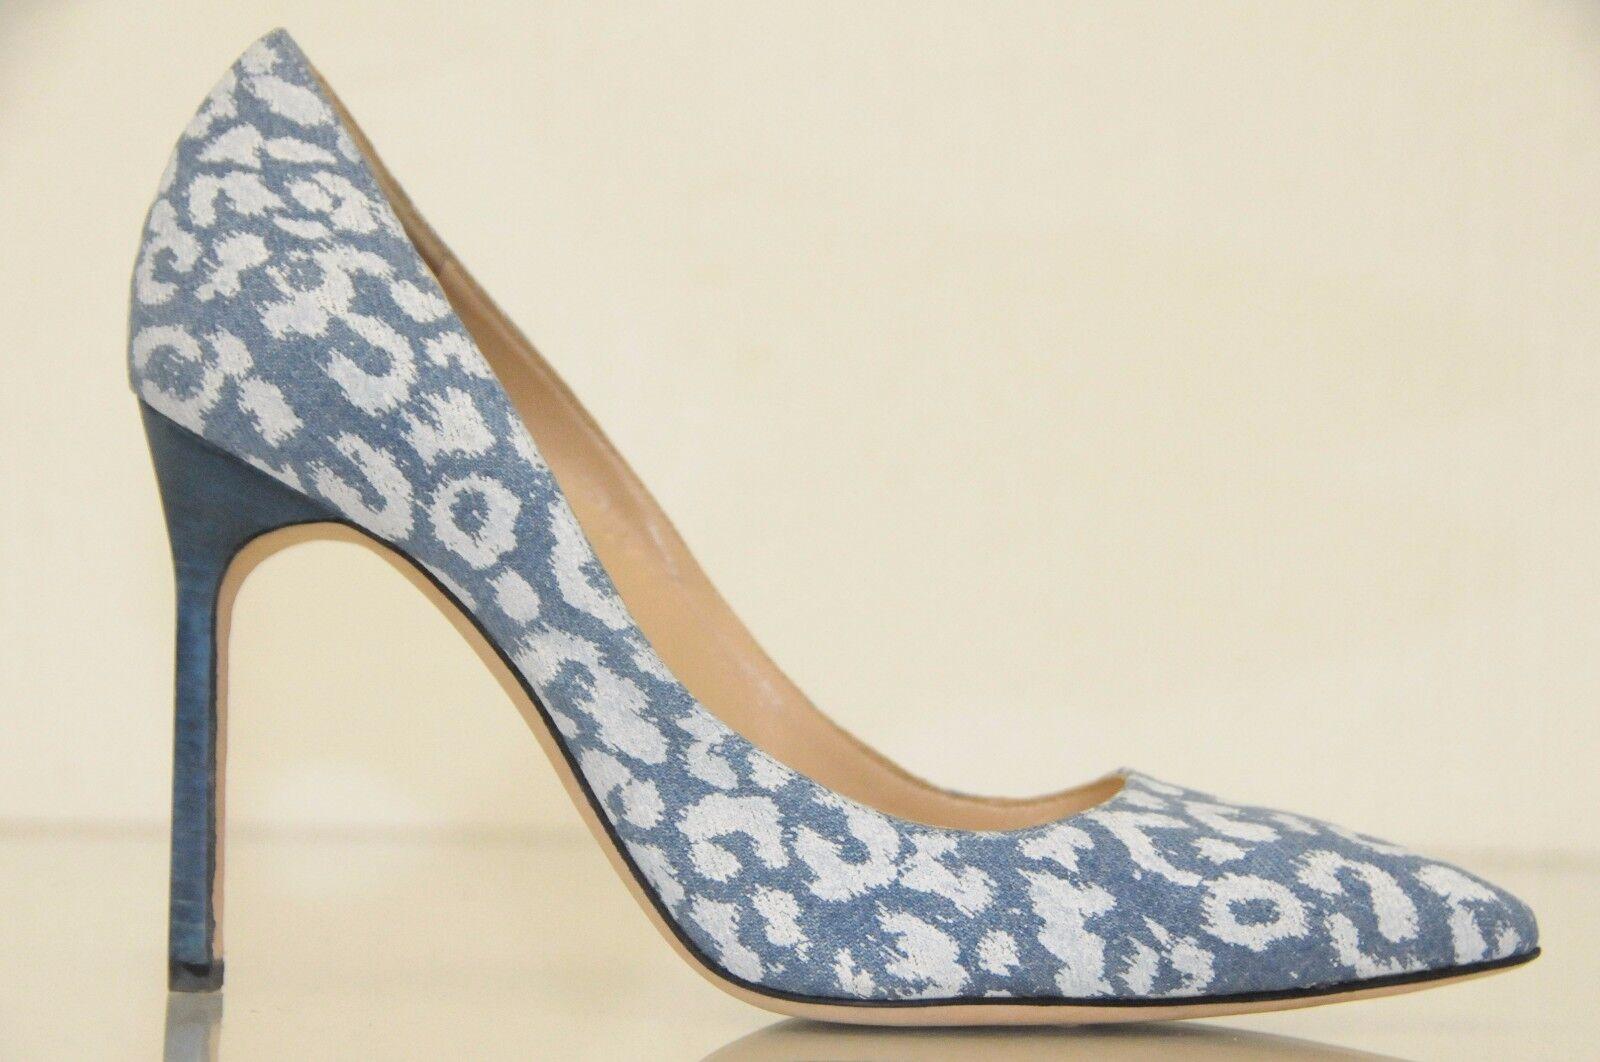 acquista online New Manolo Blahnik BB 105 blu Denim bianca Printed Leopard Leopard Leopard scarpe Pumps Heels 37  perfezionare